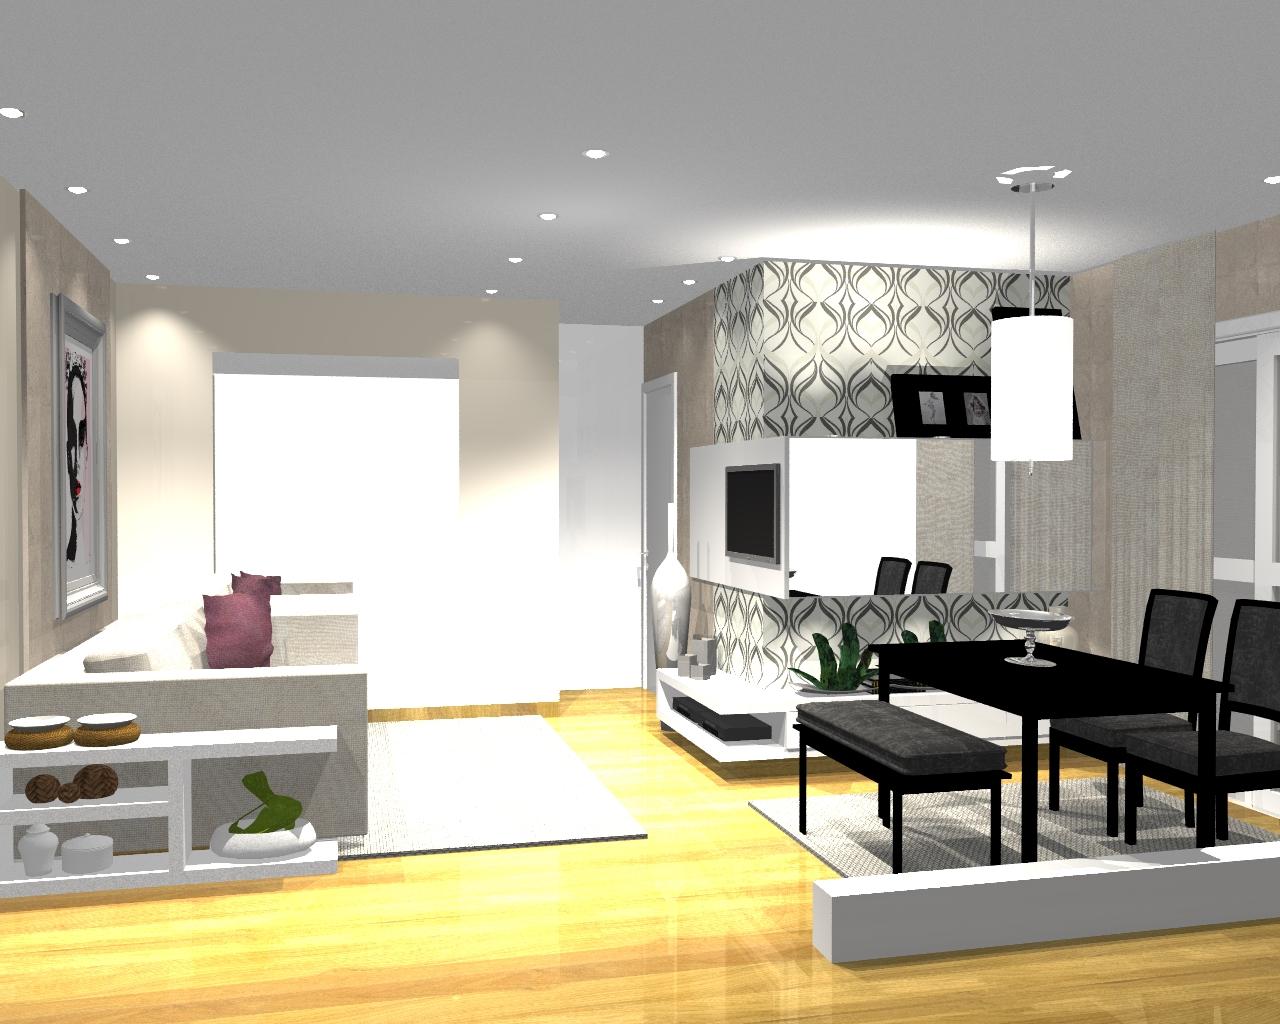 carolina lira design de interiores. Black Bedroom Furniture Sets. Home Design Ideas